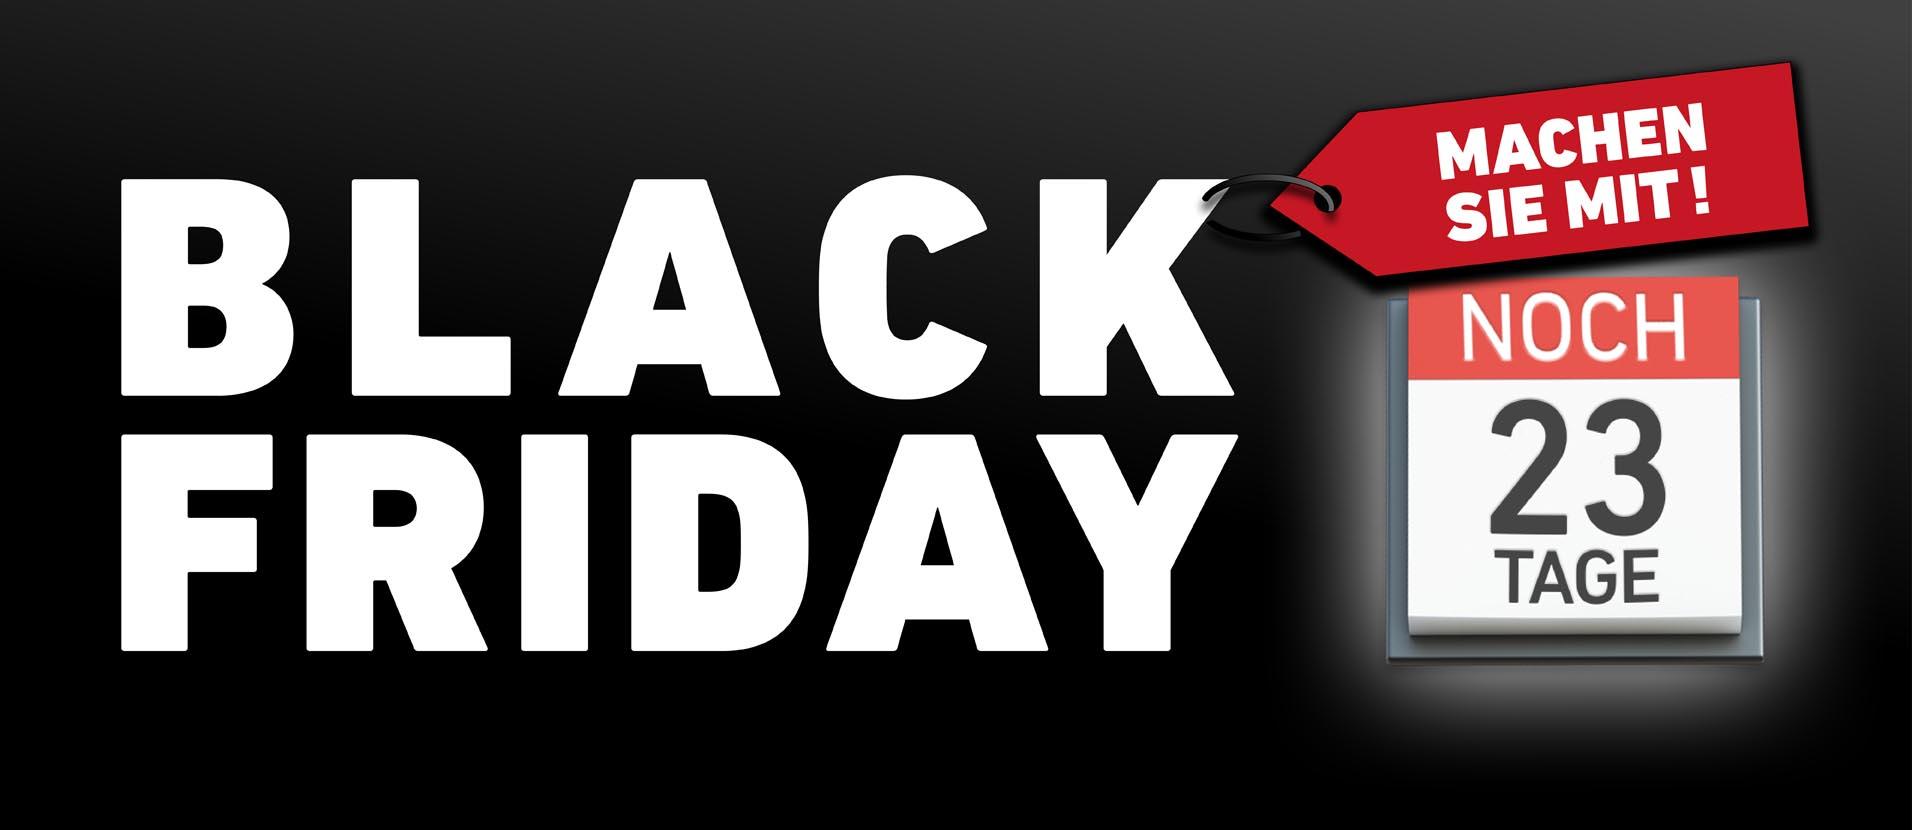 Black-Friday - Noch 23 Tage